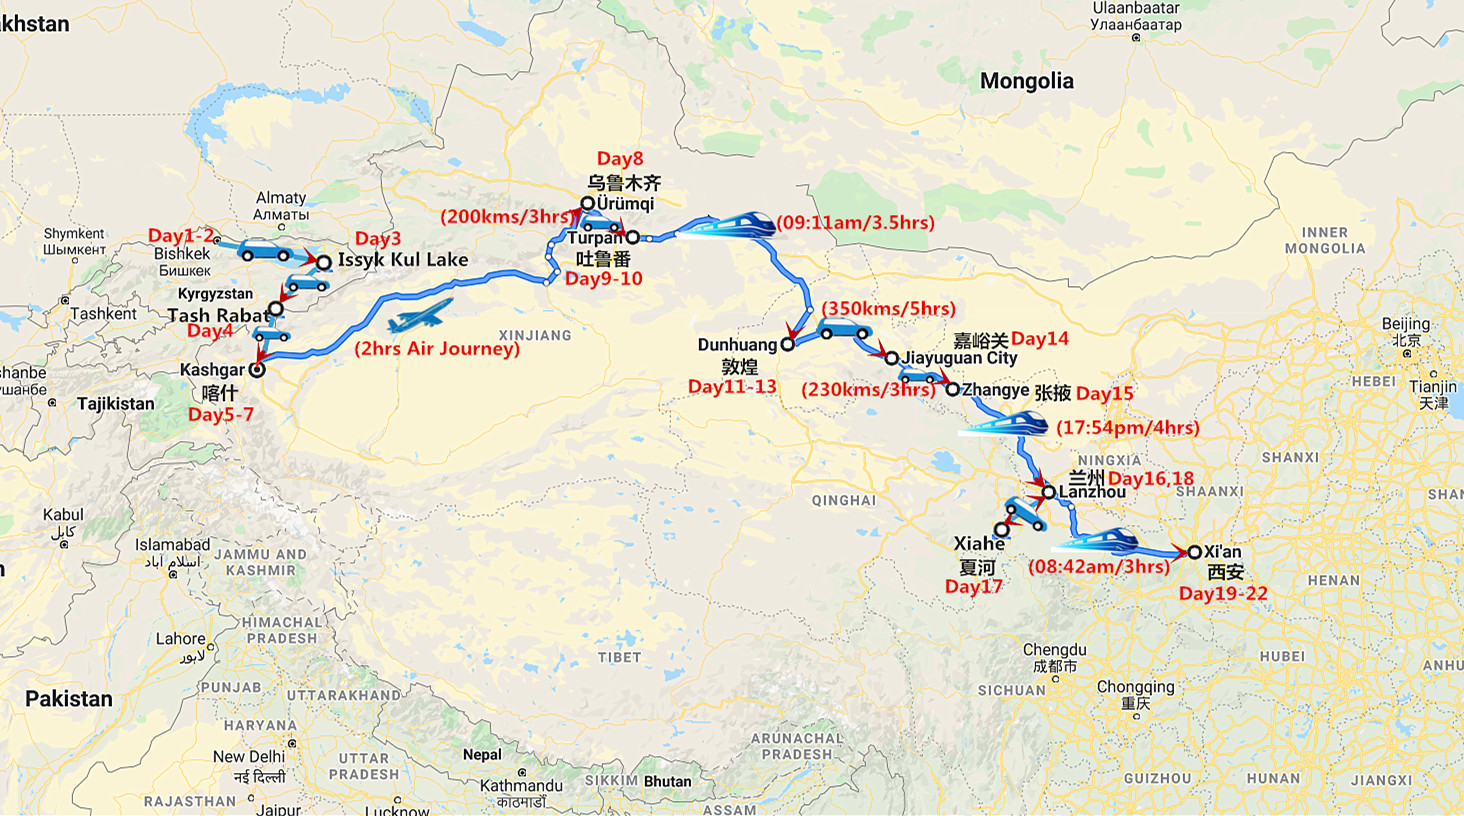 22 Days Great Silk Road Tour from Bishkek to Xi'an Travel Map